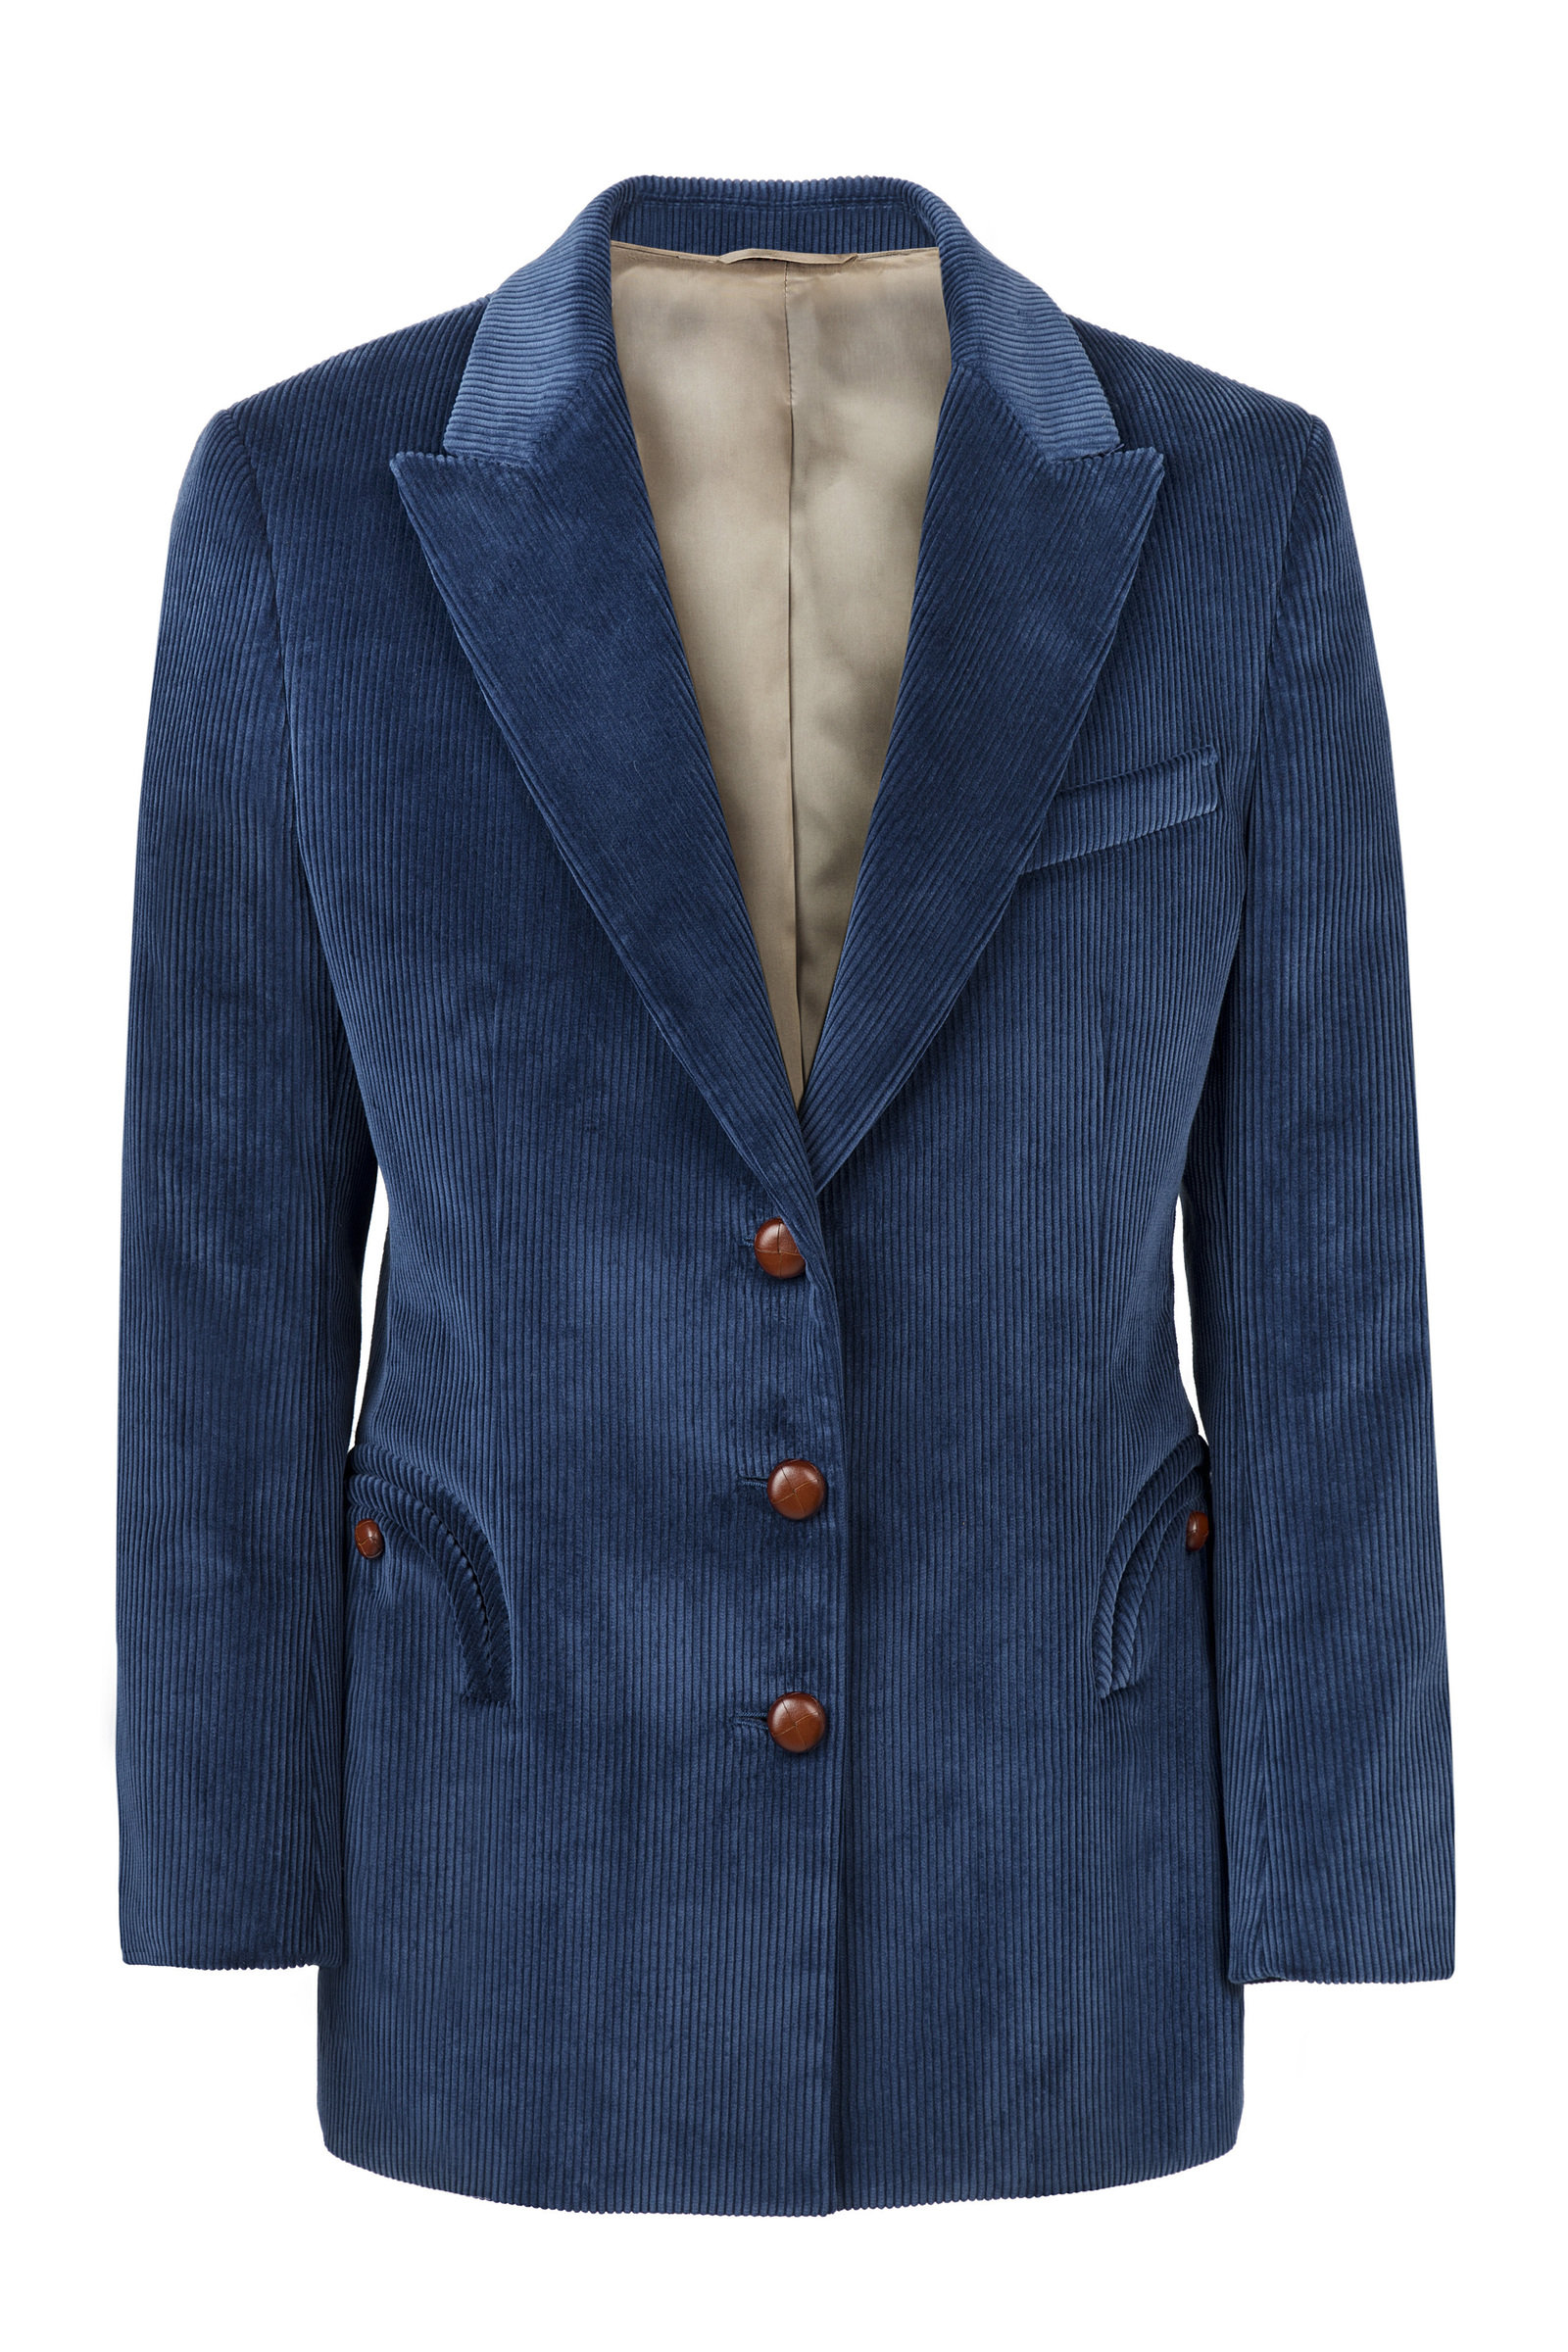 Women's Classic Touch Royal Tomboy Cotton Blazer